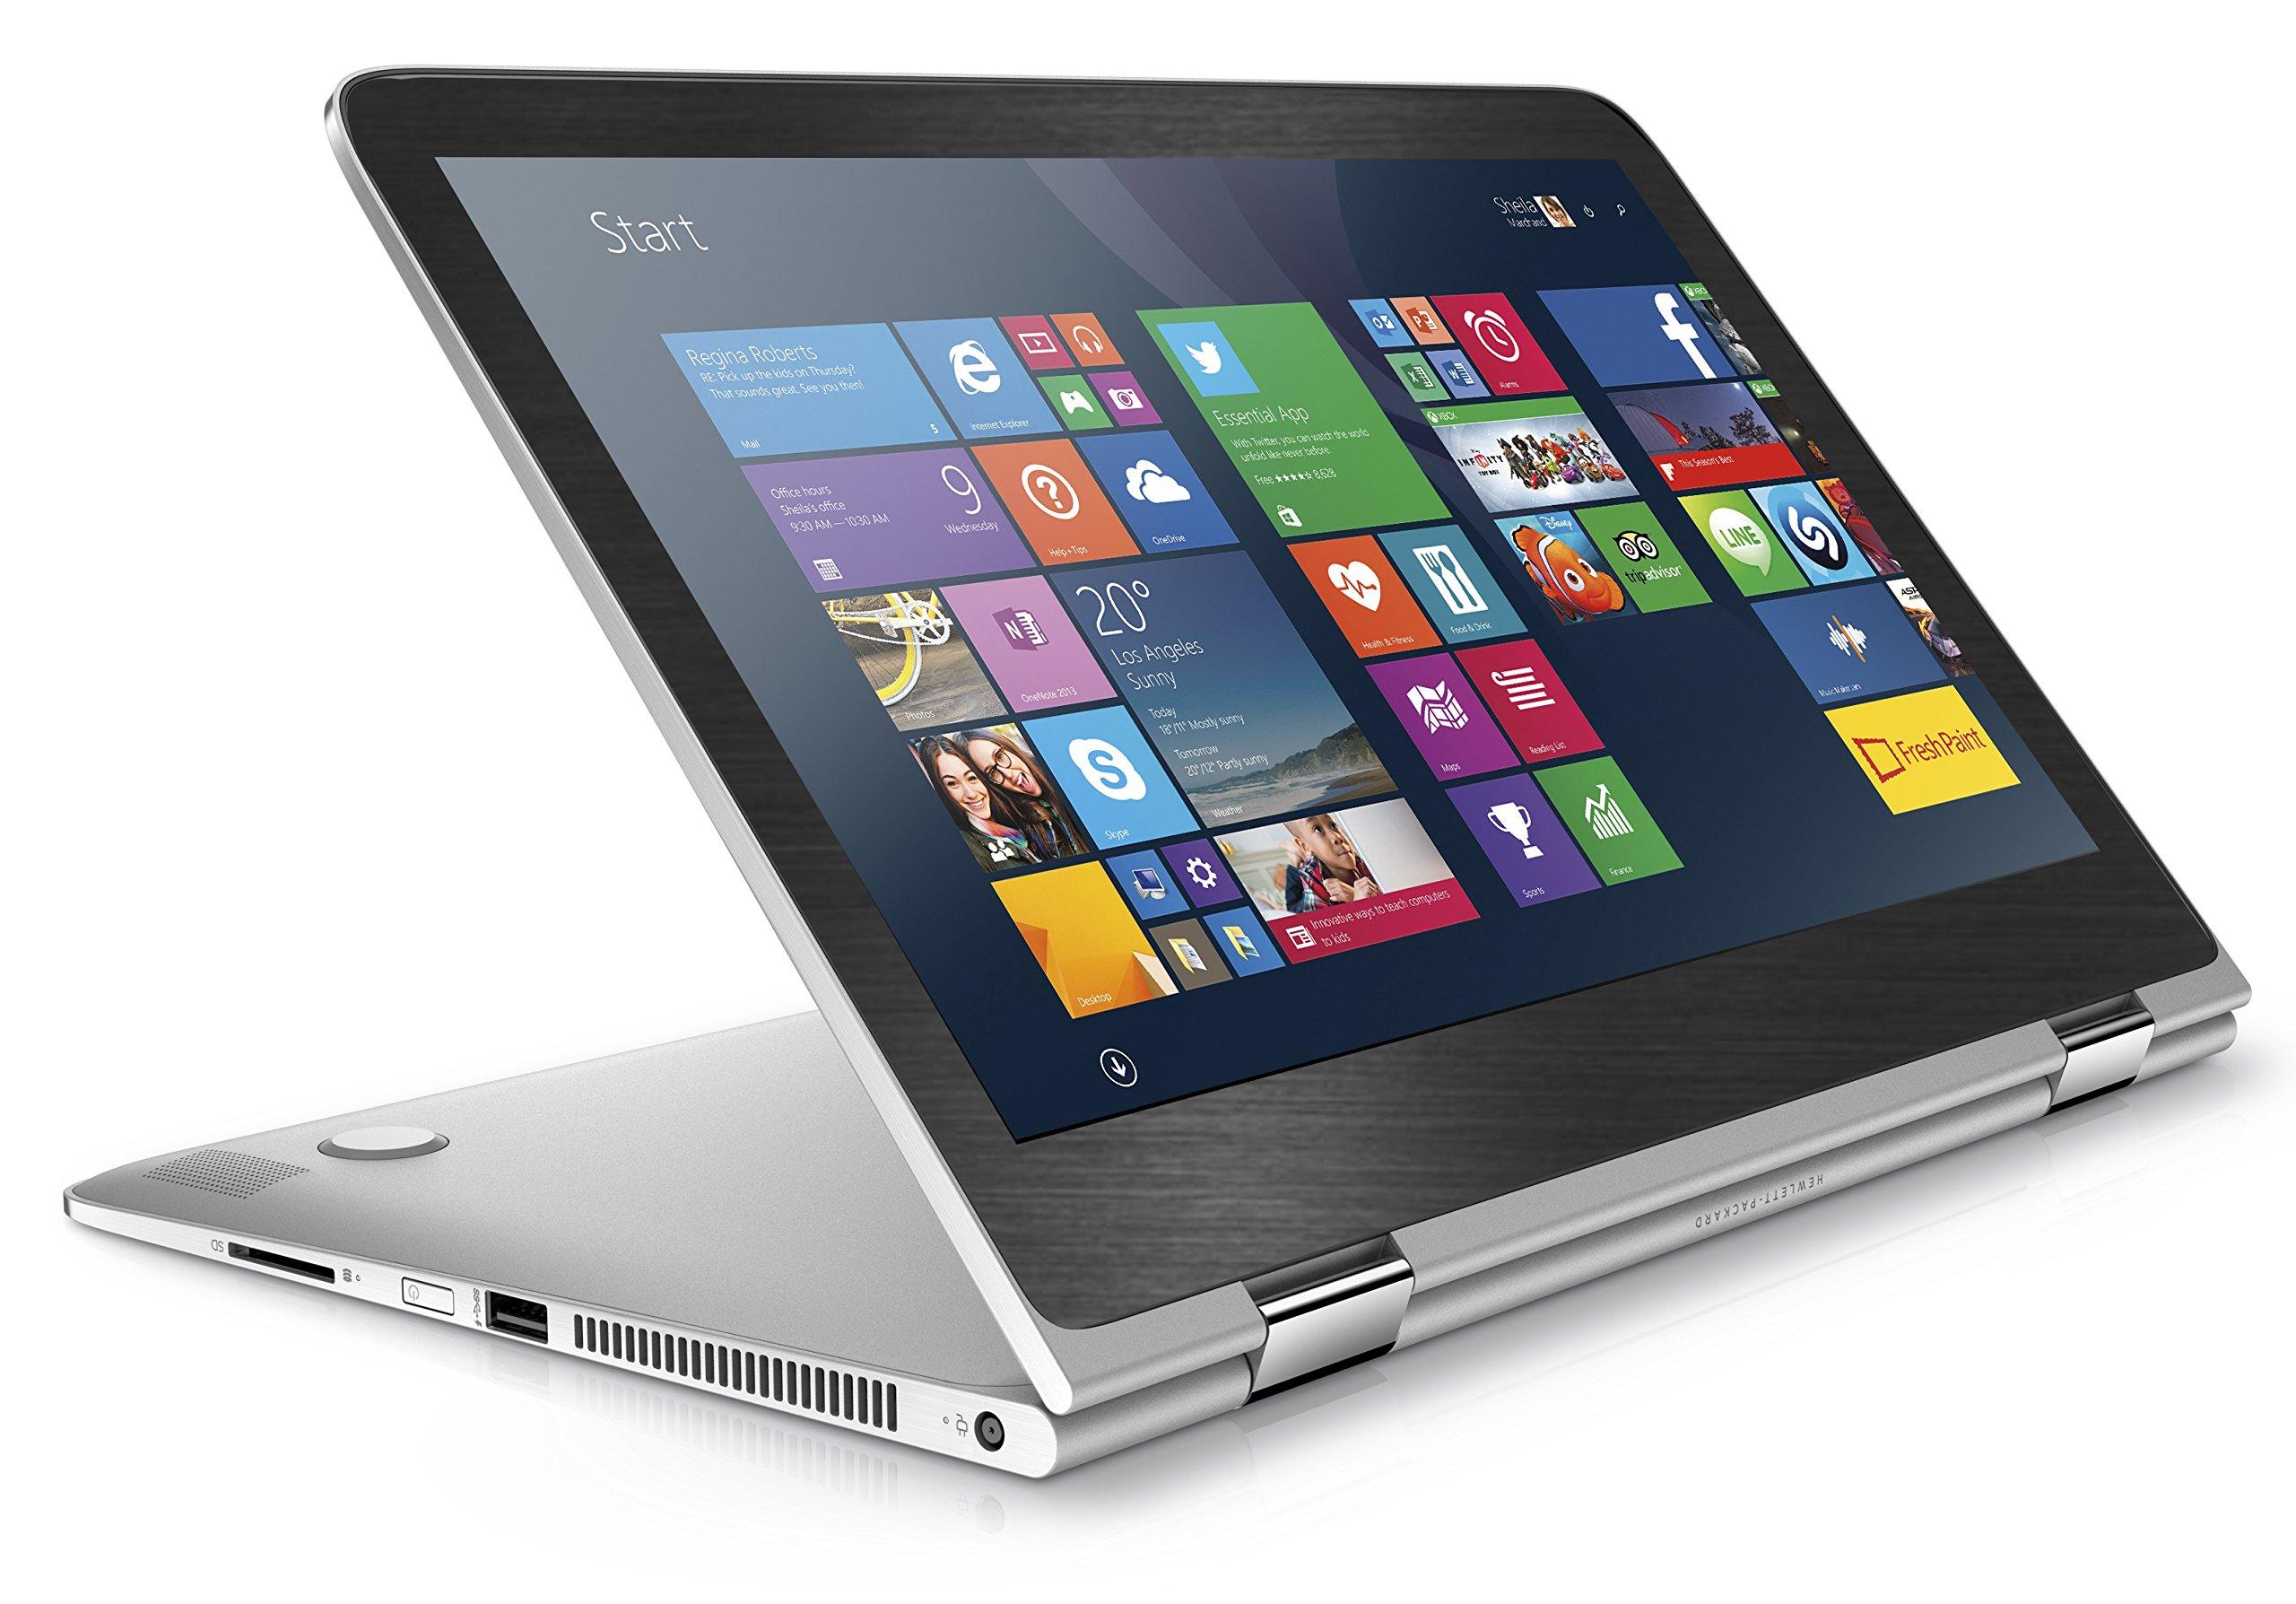 Black Brushed Aluminum skin decal wrap skin case for HP Spectre x360 13.3'' Laptop